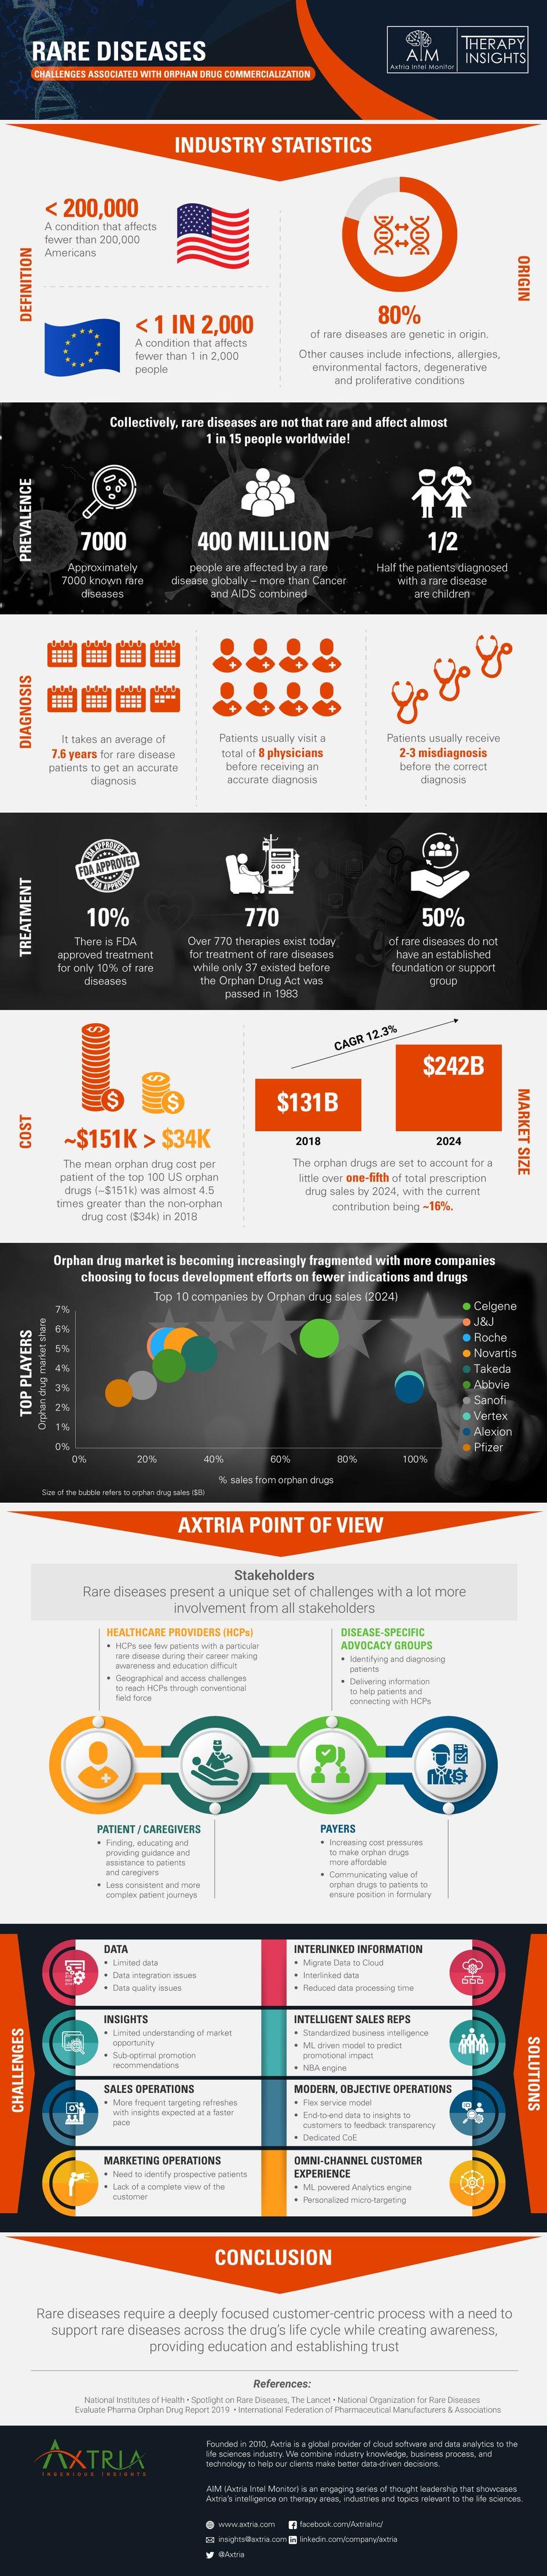 Rare-disease-infographic_v6